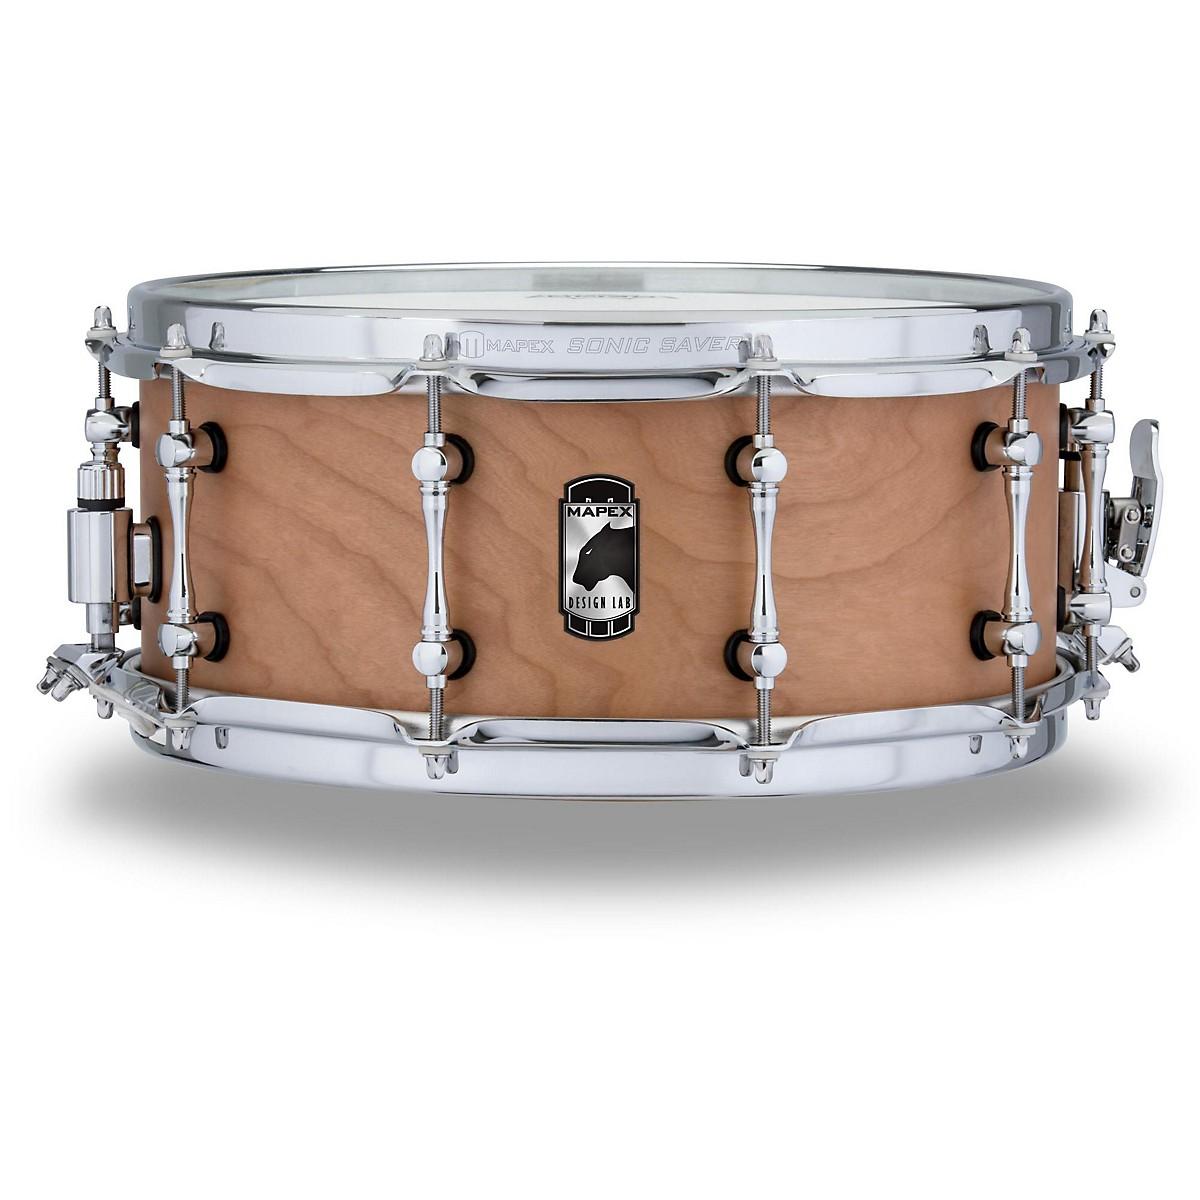 Mapex Black Panther Design Lab Cherry Bomb Snare Drum